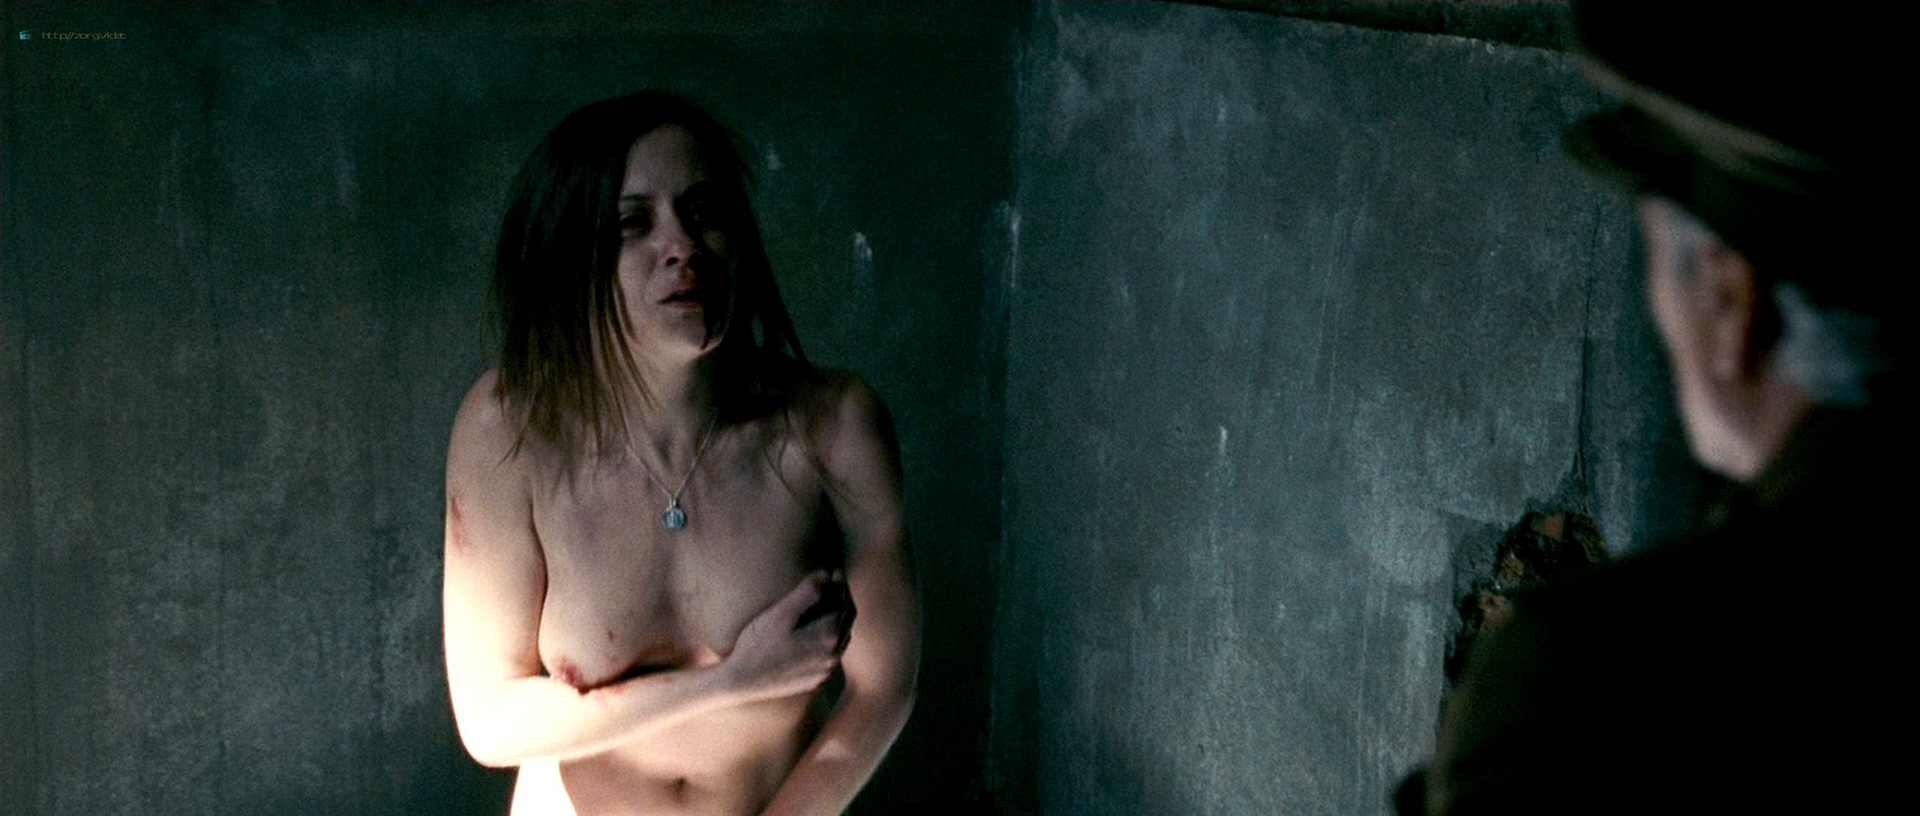 Maria Leon nude in - La voz dormida (2011) HD 1080p BluRay (4)